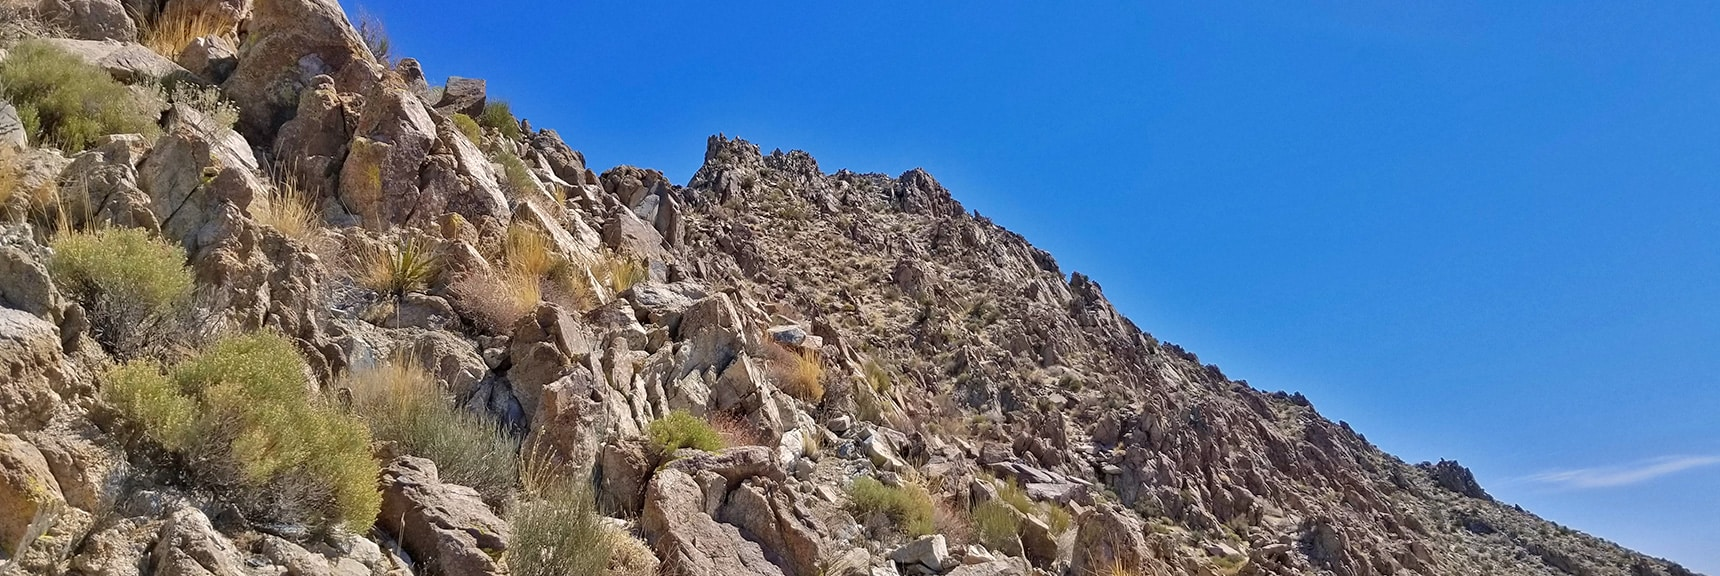 Mt. Wilson Summit from Summit Approach Ridge.   Horse Thief Canyon Loop   Mt. Wilson   Black Mountains   Lake Mead National Recreation Area, Arizona